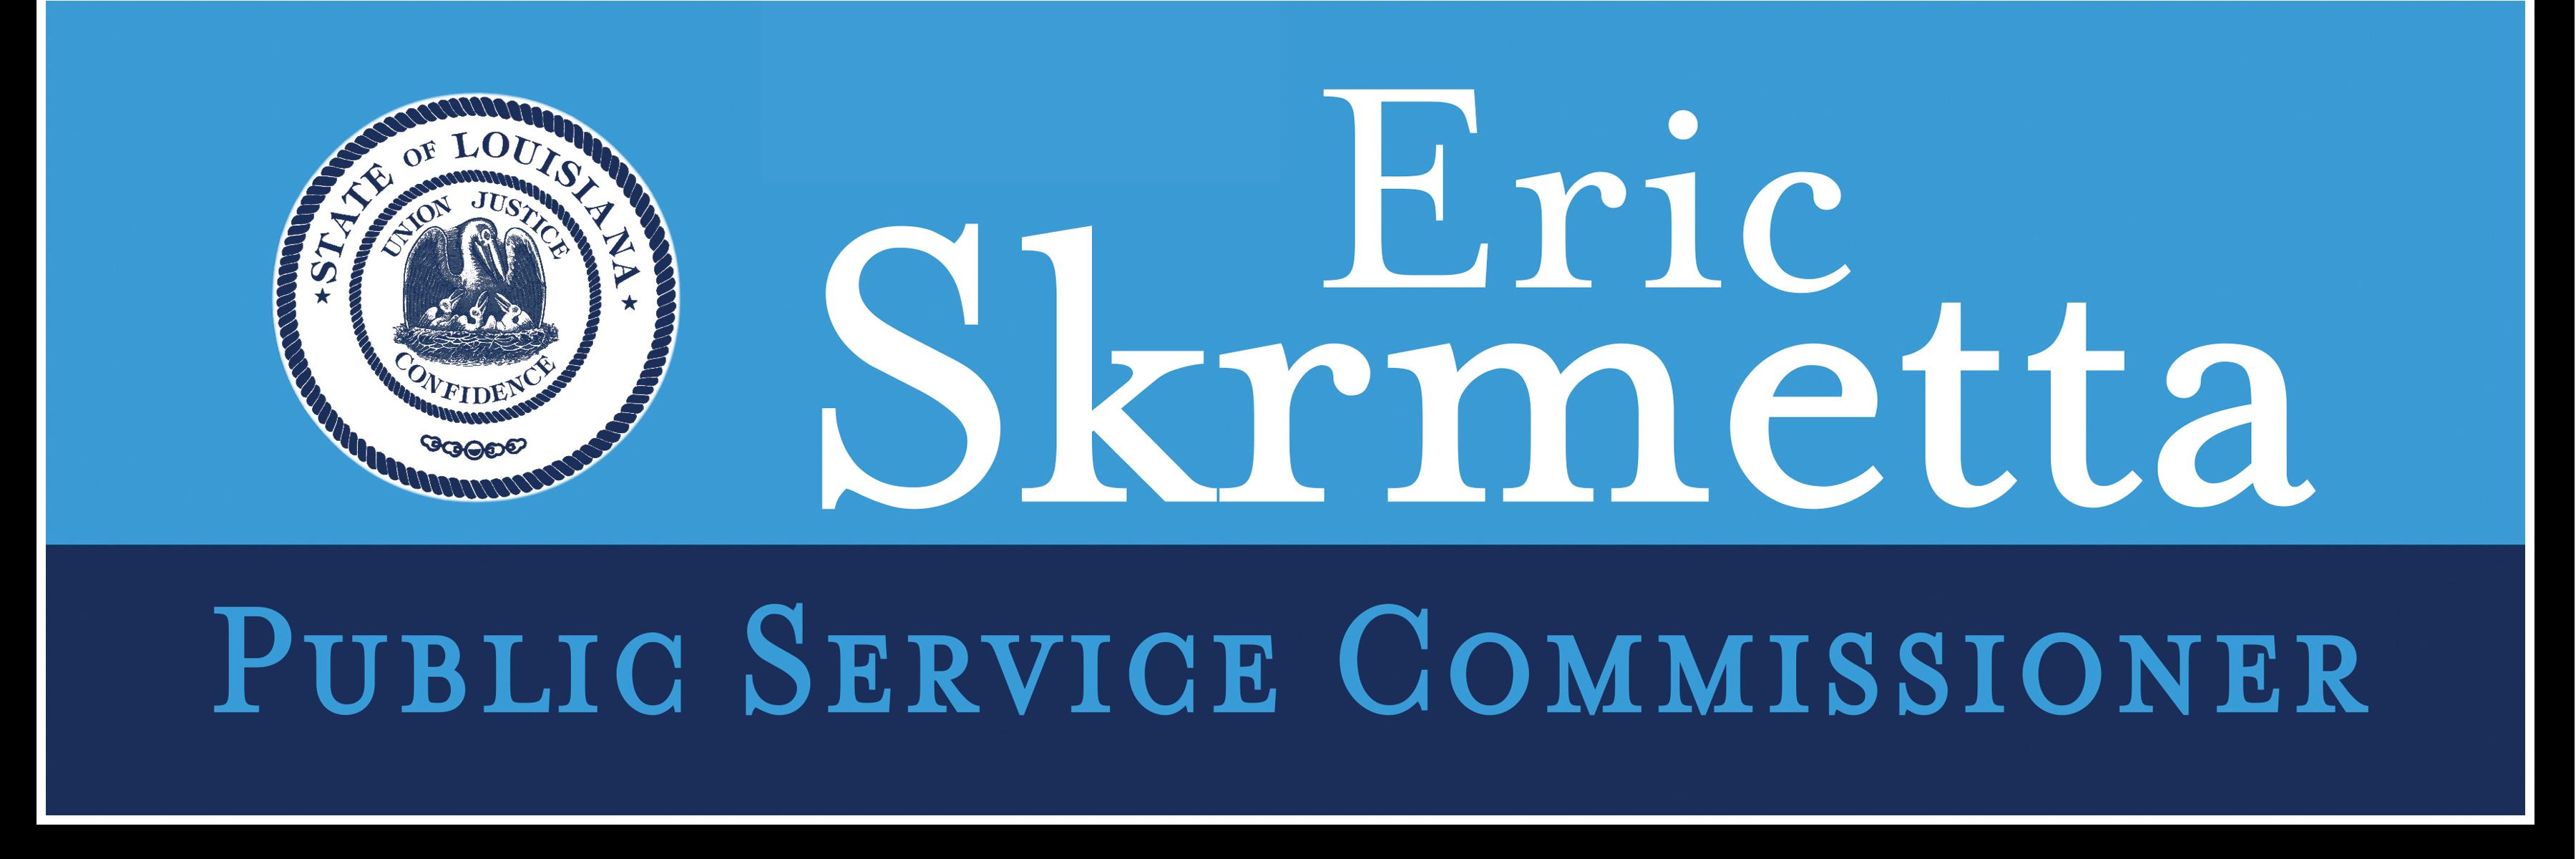 Eric Skrmetta